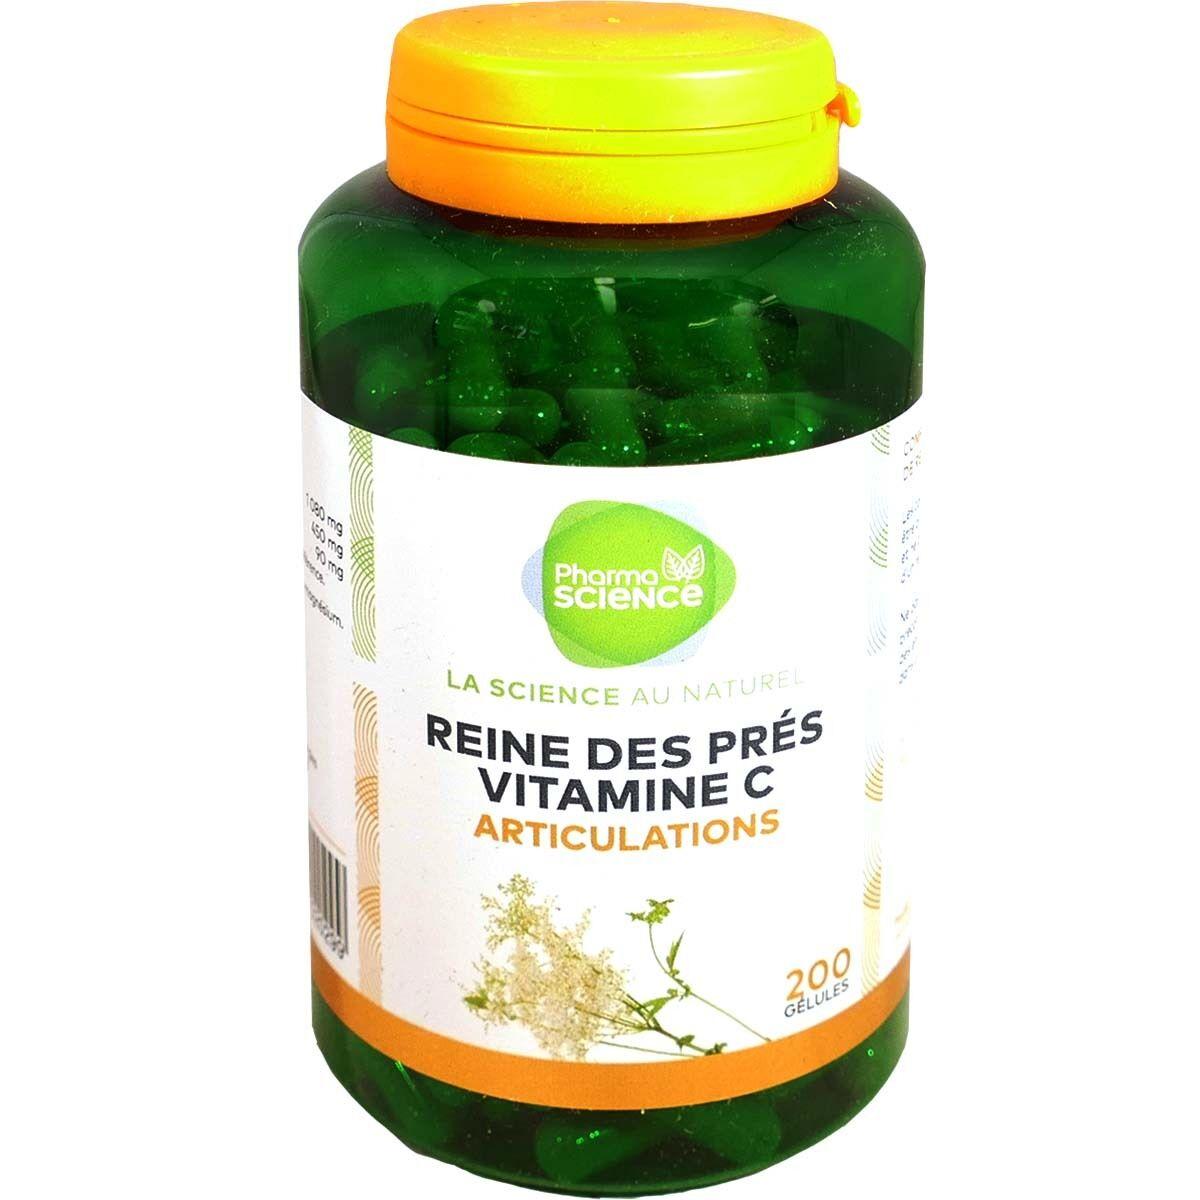 Pharmascience reine des pres vitamine c bio 200 gelules